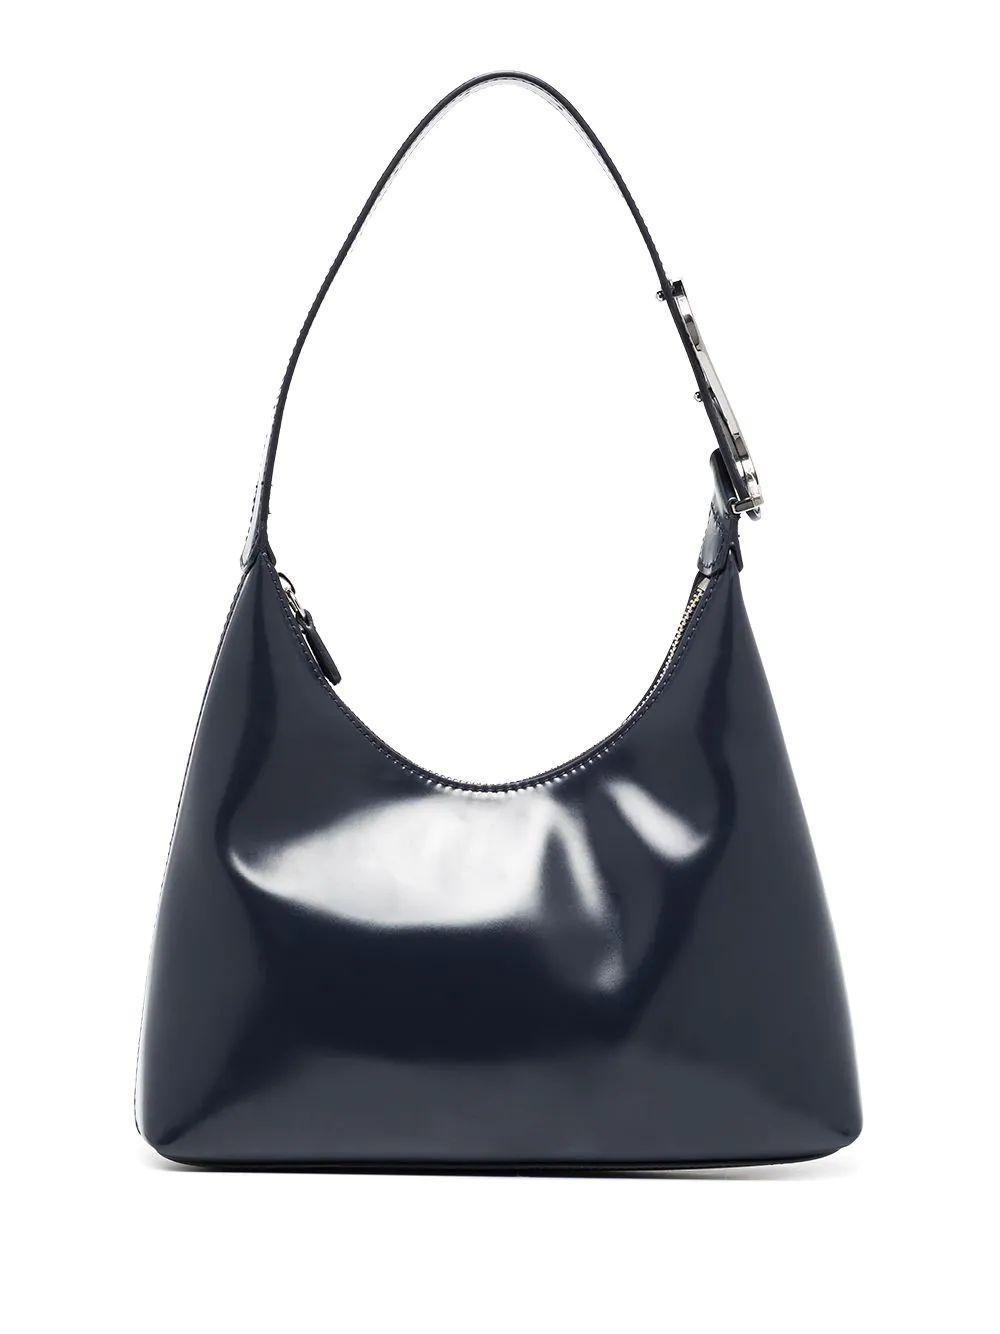 Scotty Bag